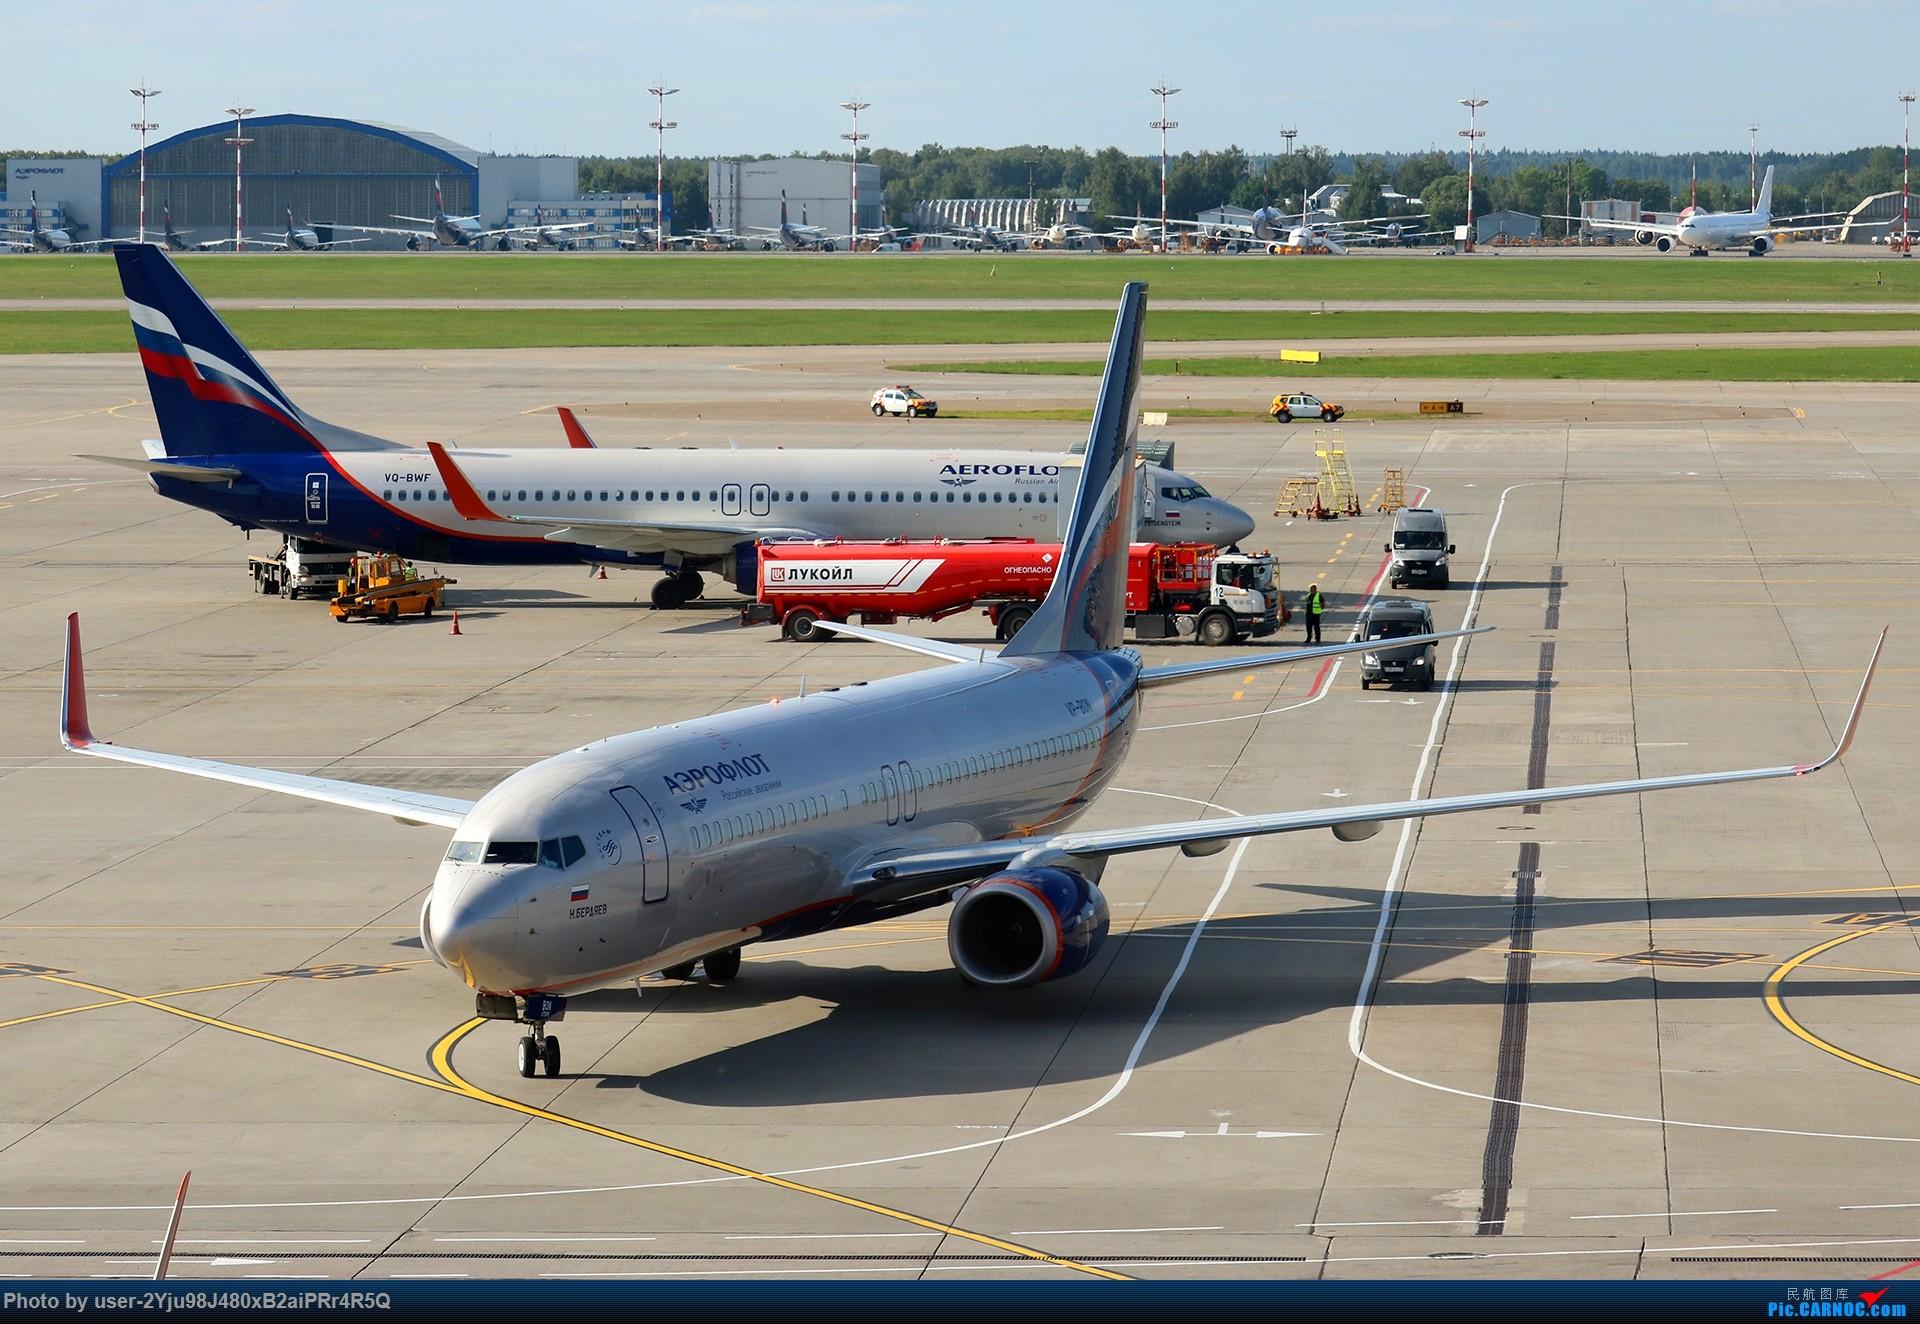 Re:[原创]LIULIU Sheremetyevo的漫游 Aeroflot毛航篇 BOEING 737-8LJ(WL) VP-BON 俄罗斯谢诺梅杰沃机场